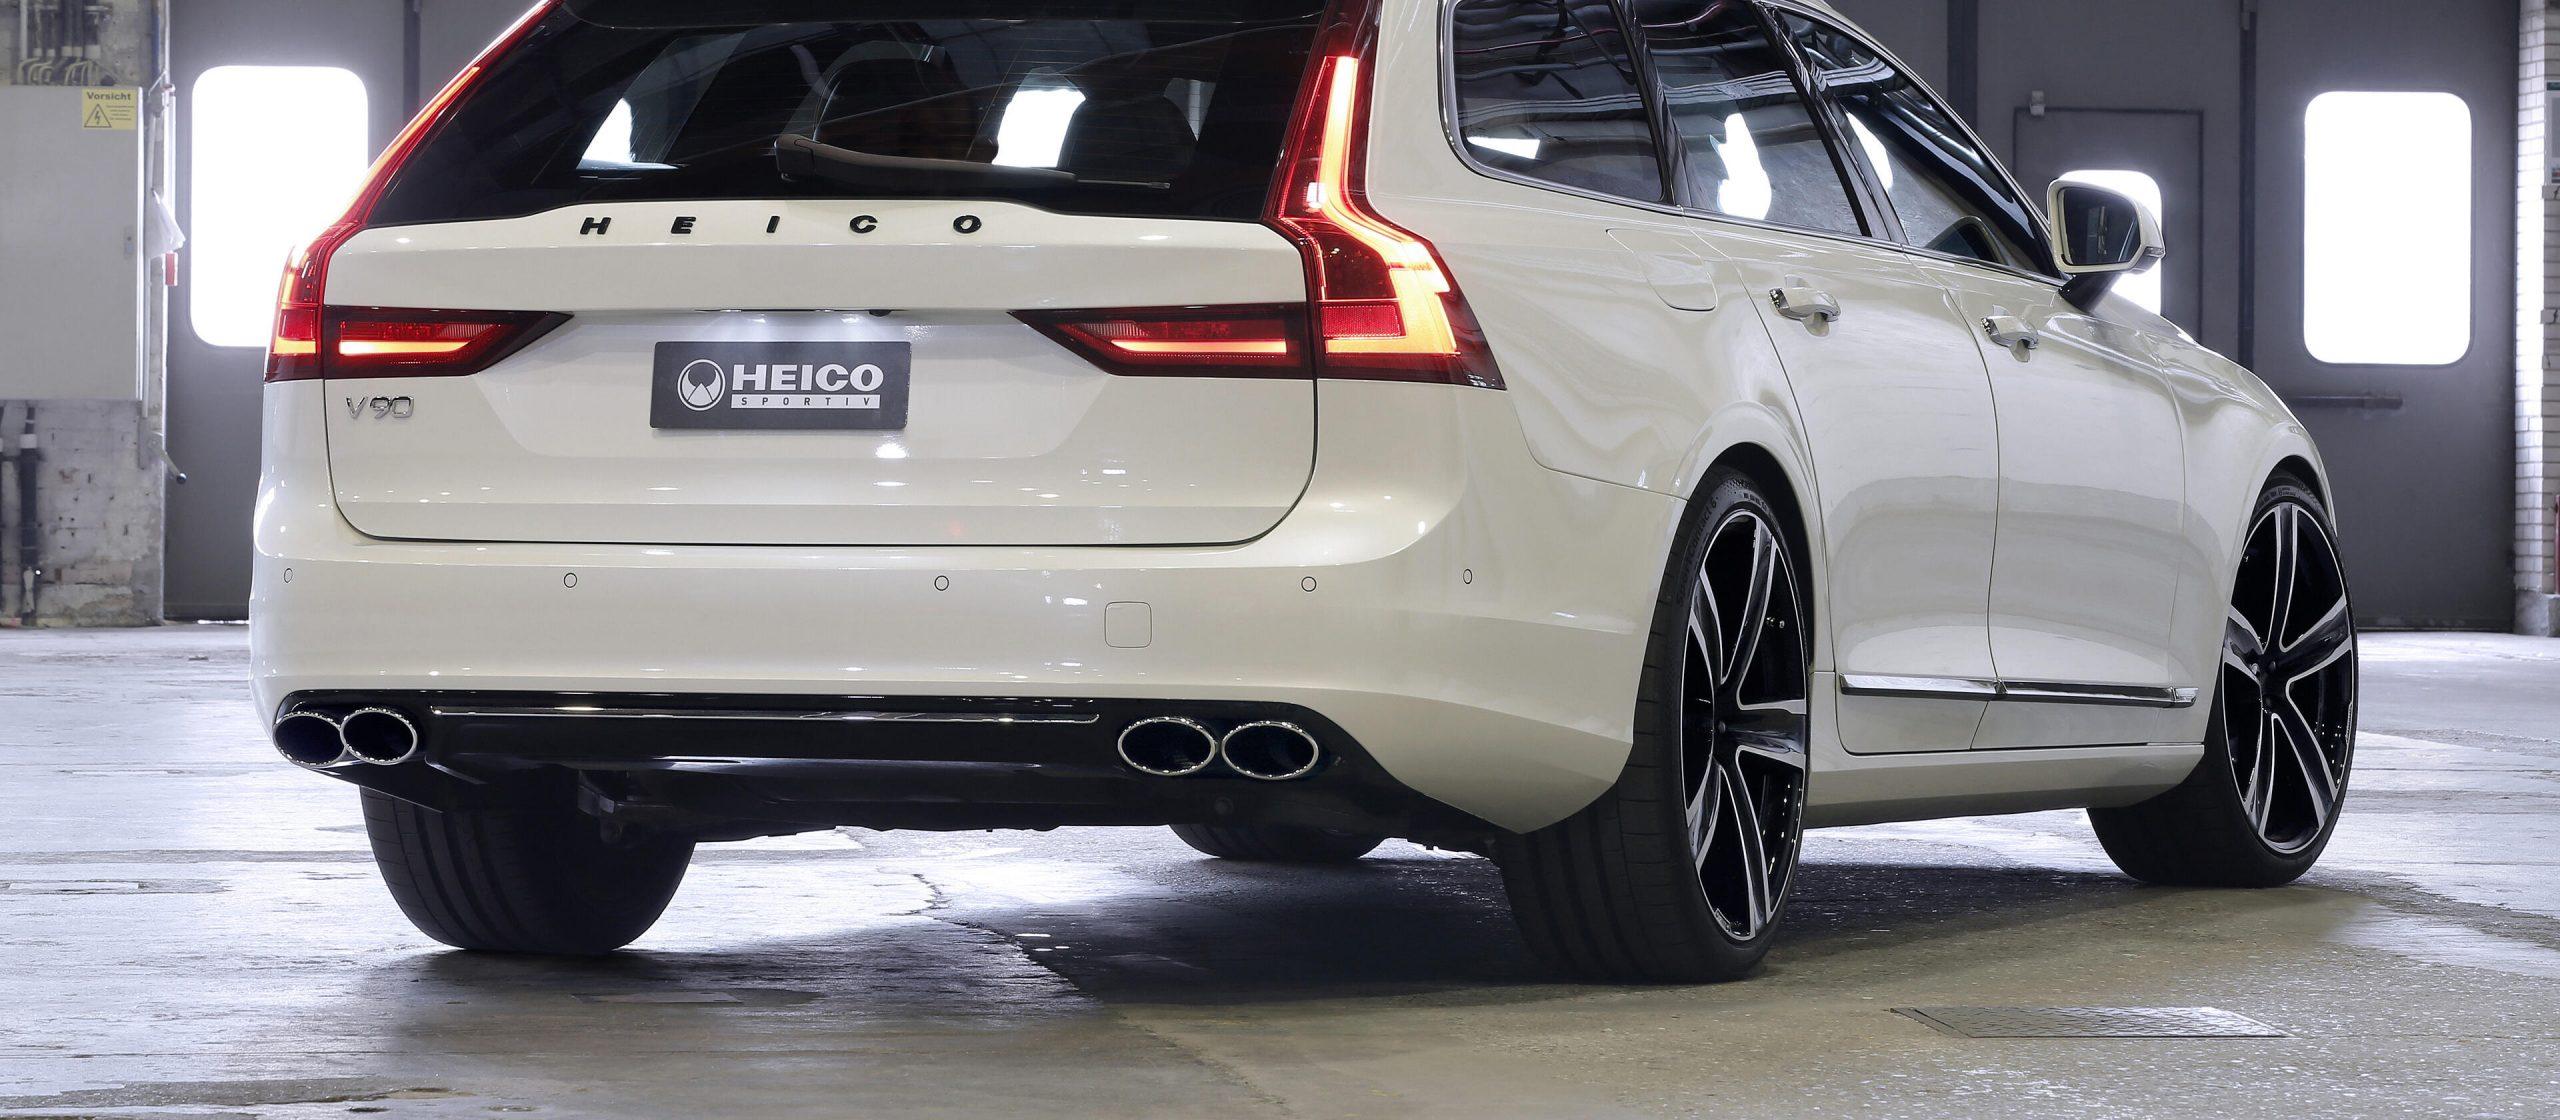 heico-sportiv-volvo-v90-235-rear-1-hero-slider